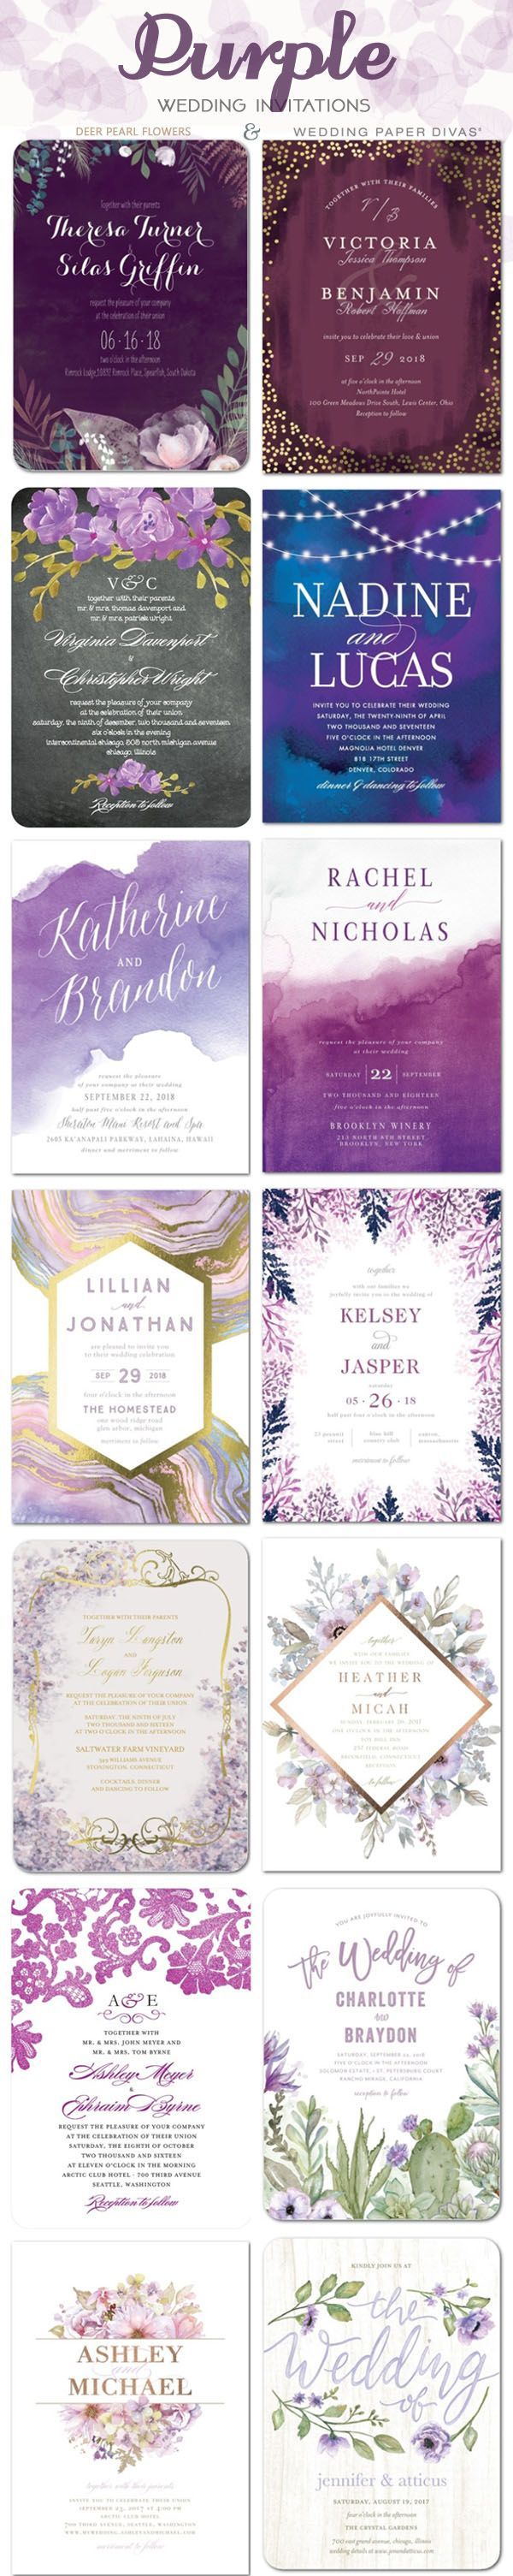 Purple wedding color ideas - Purple wedding invitations / http://www.deerpearlflowers.com/wedding-paper-divas-wedding-invitations/2/